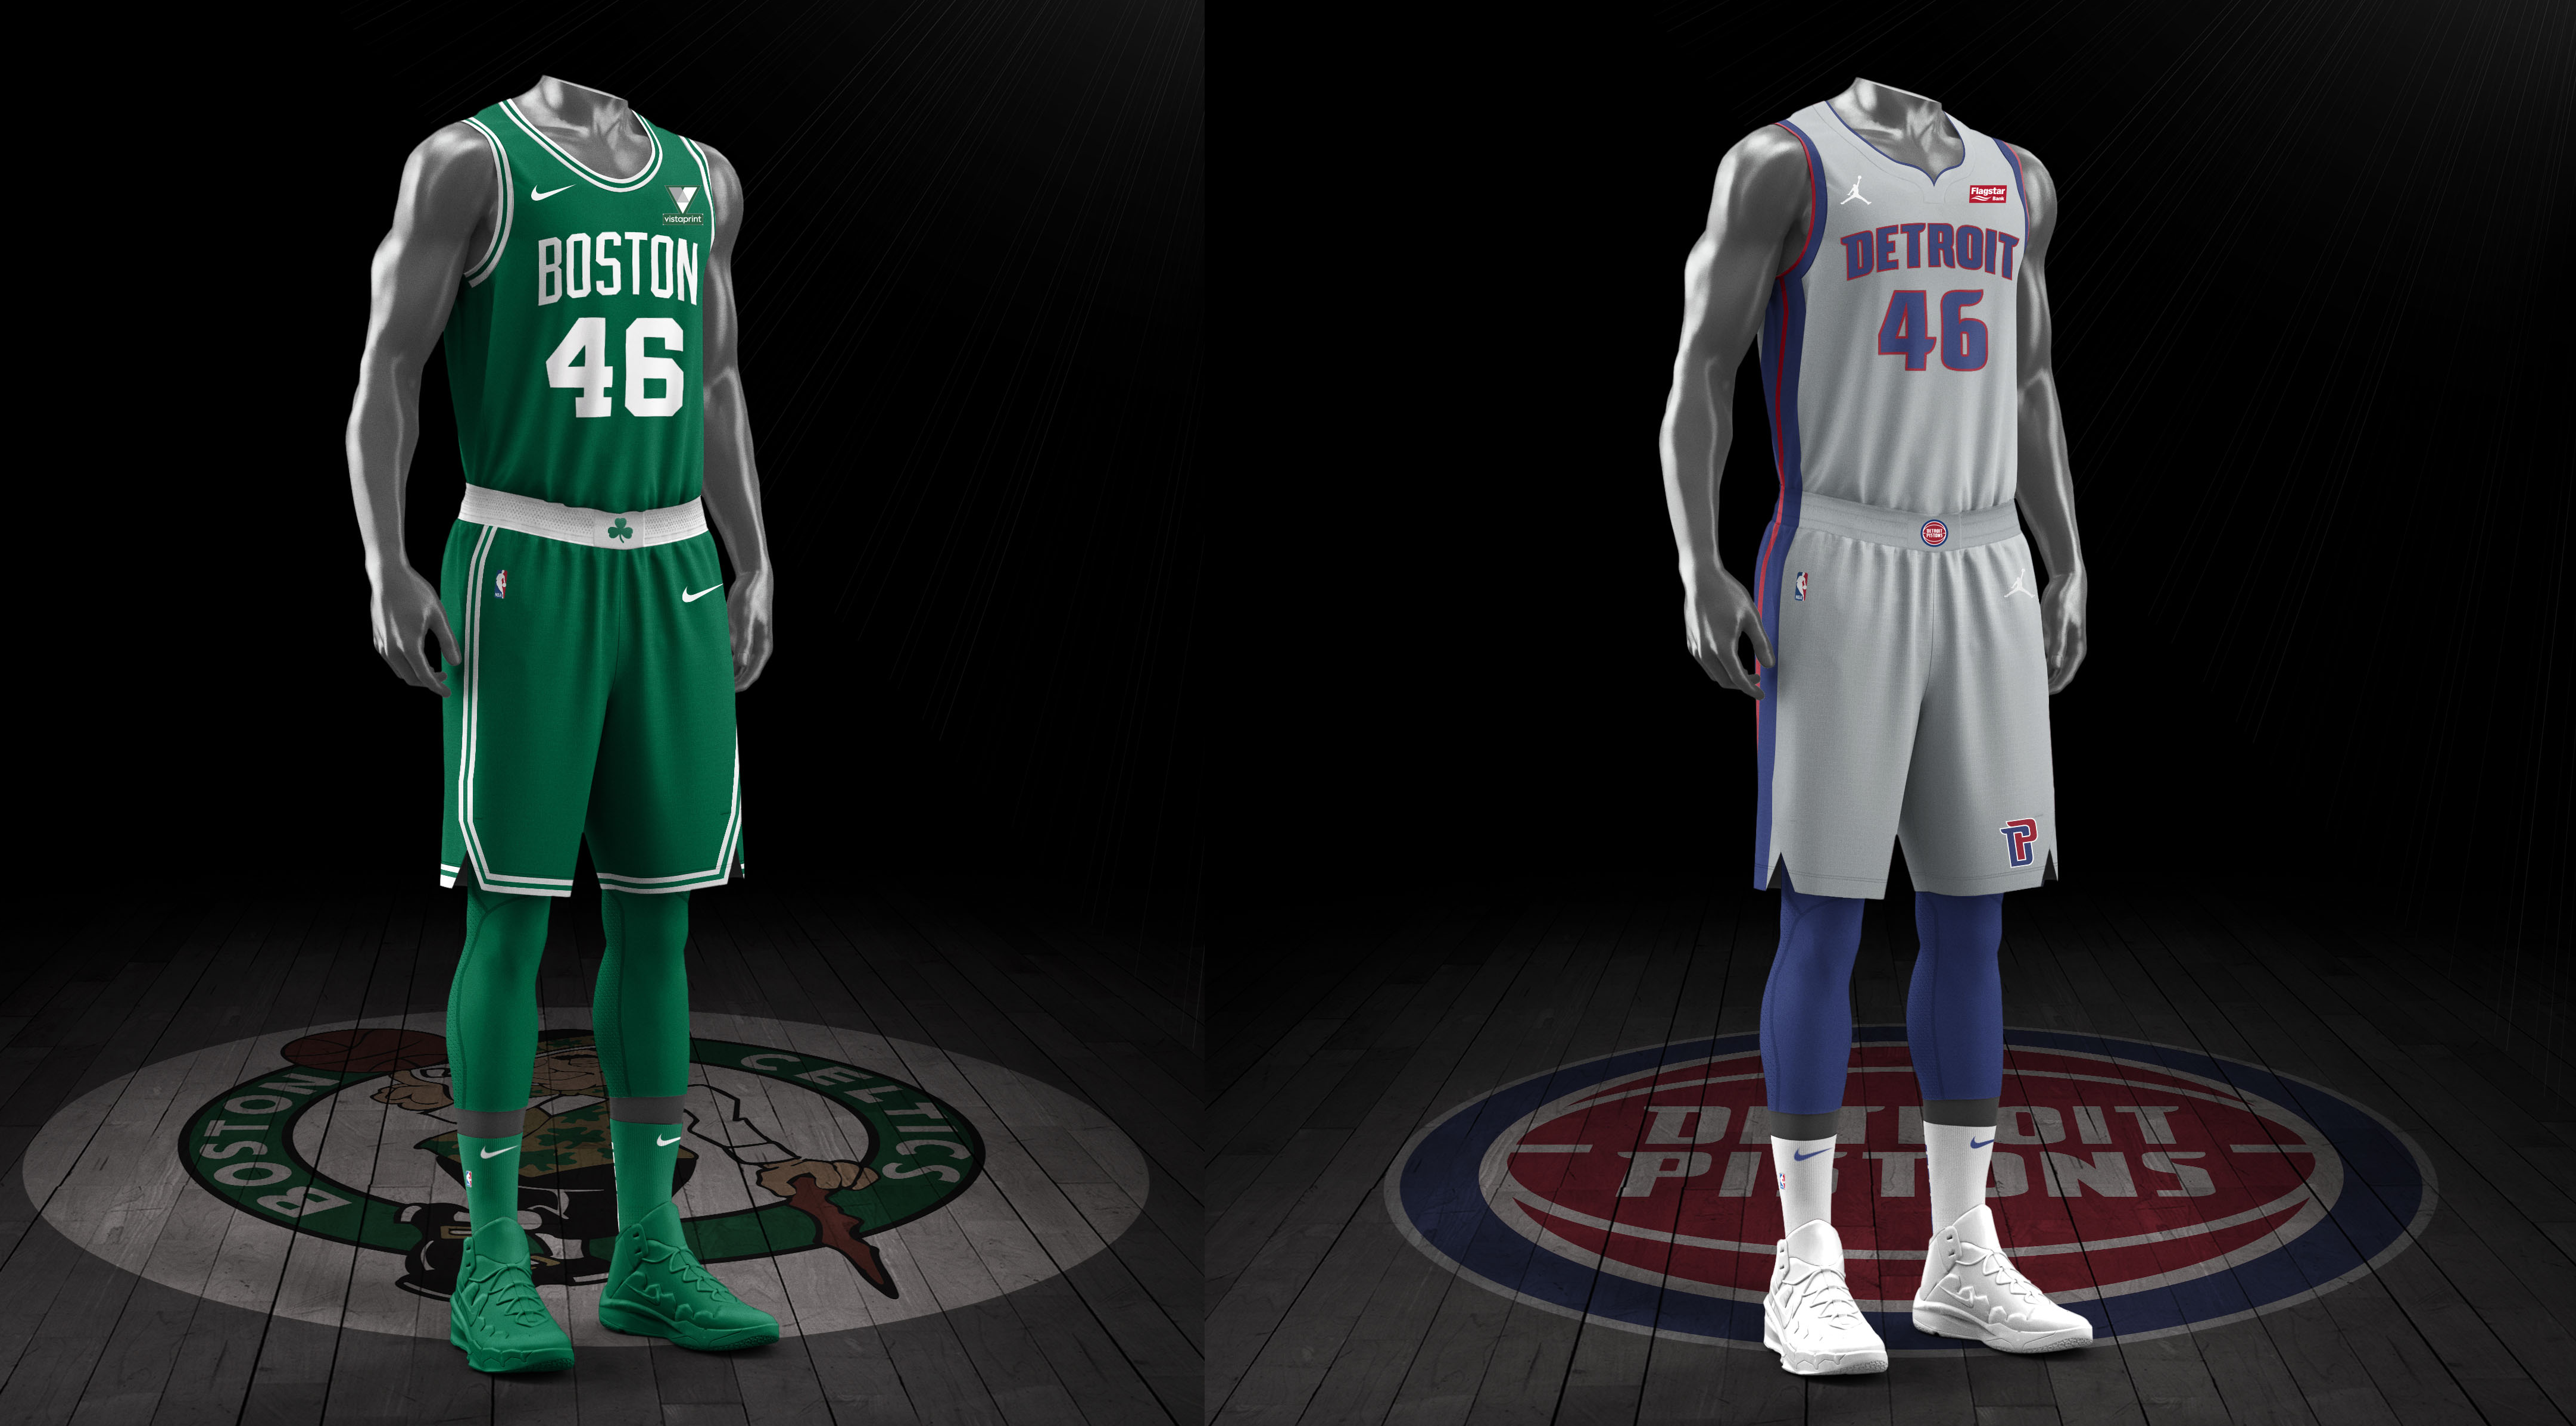 Boston Celtics vs Detroit Pistons preview, officials, uniforms, injuries, odds